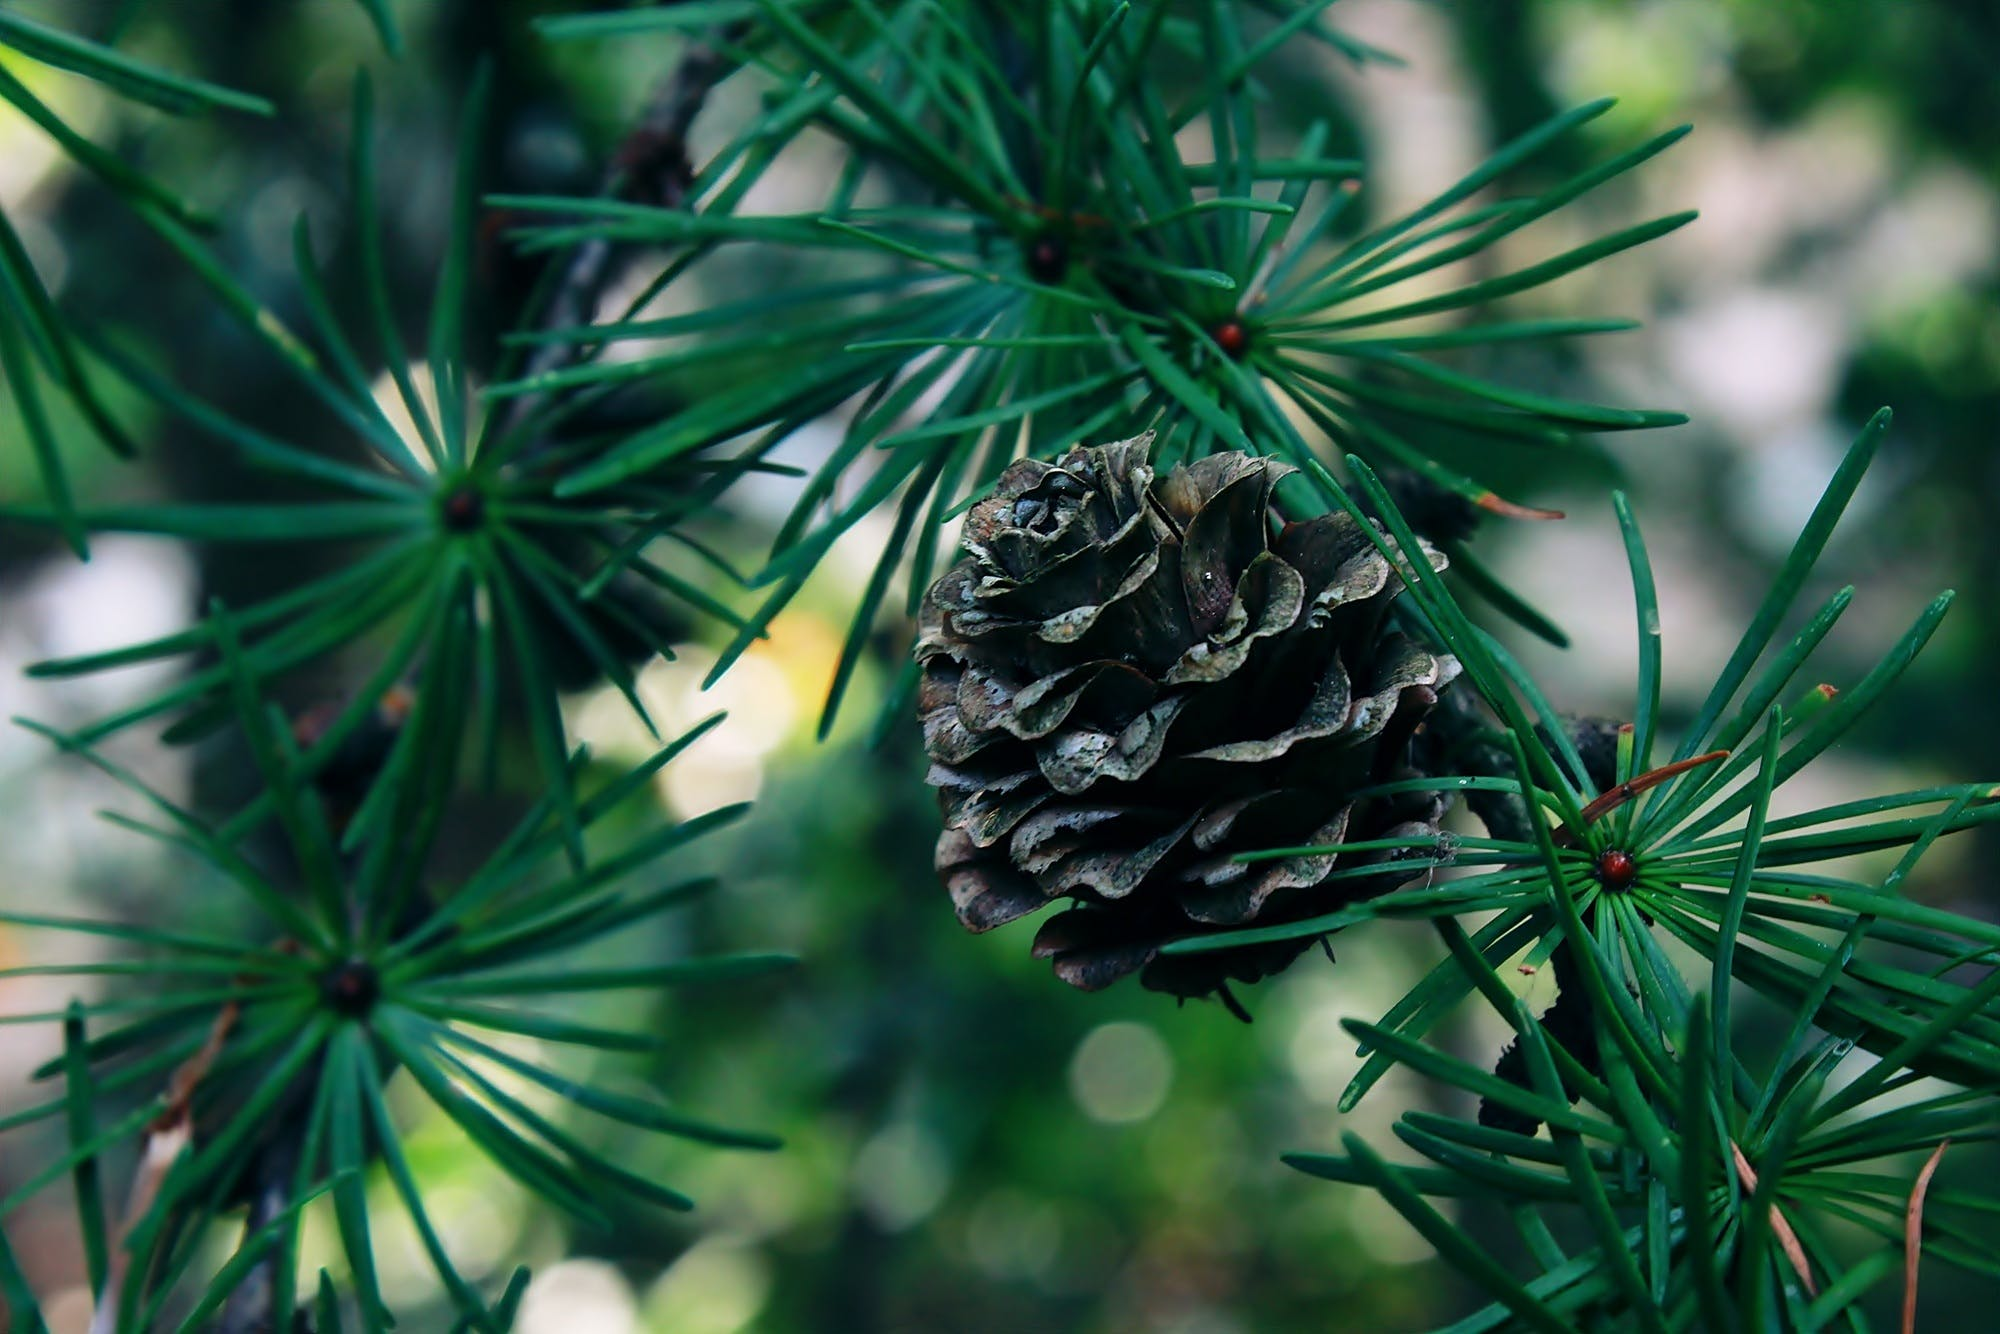 Kostenloses Stock Foto zu natur, wald, winter, pflanze